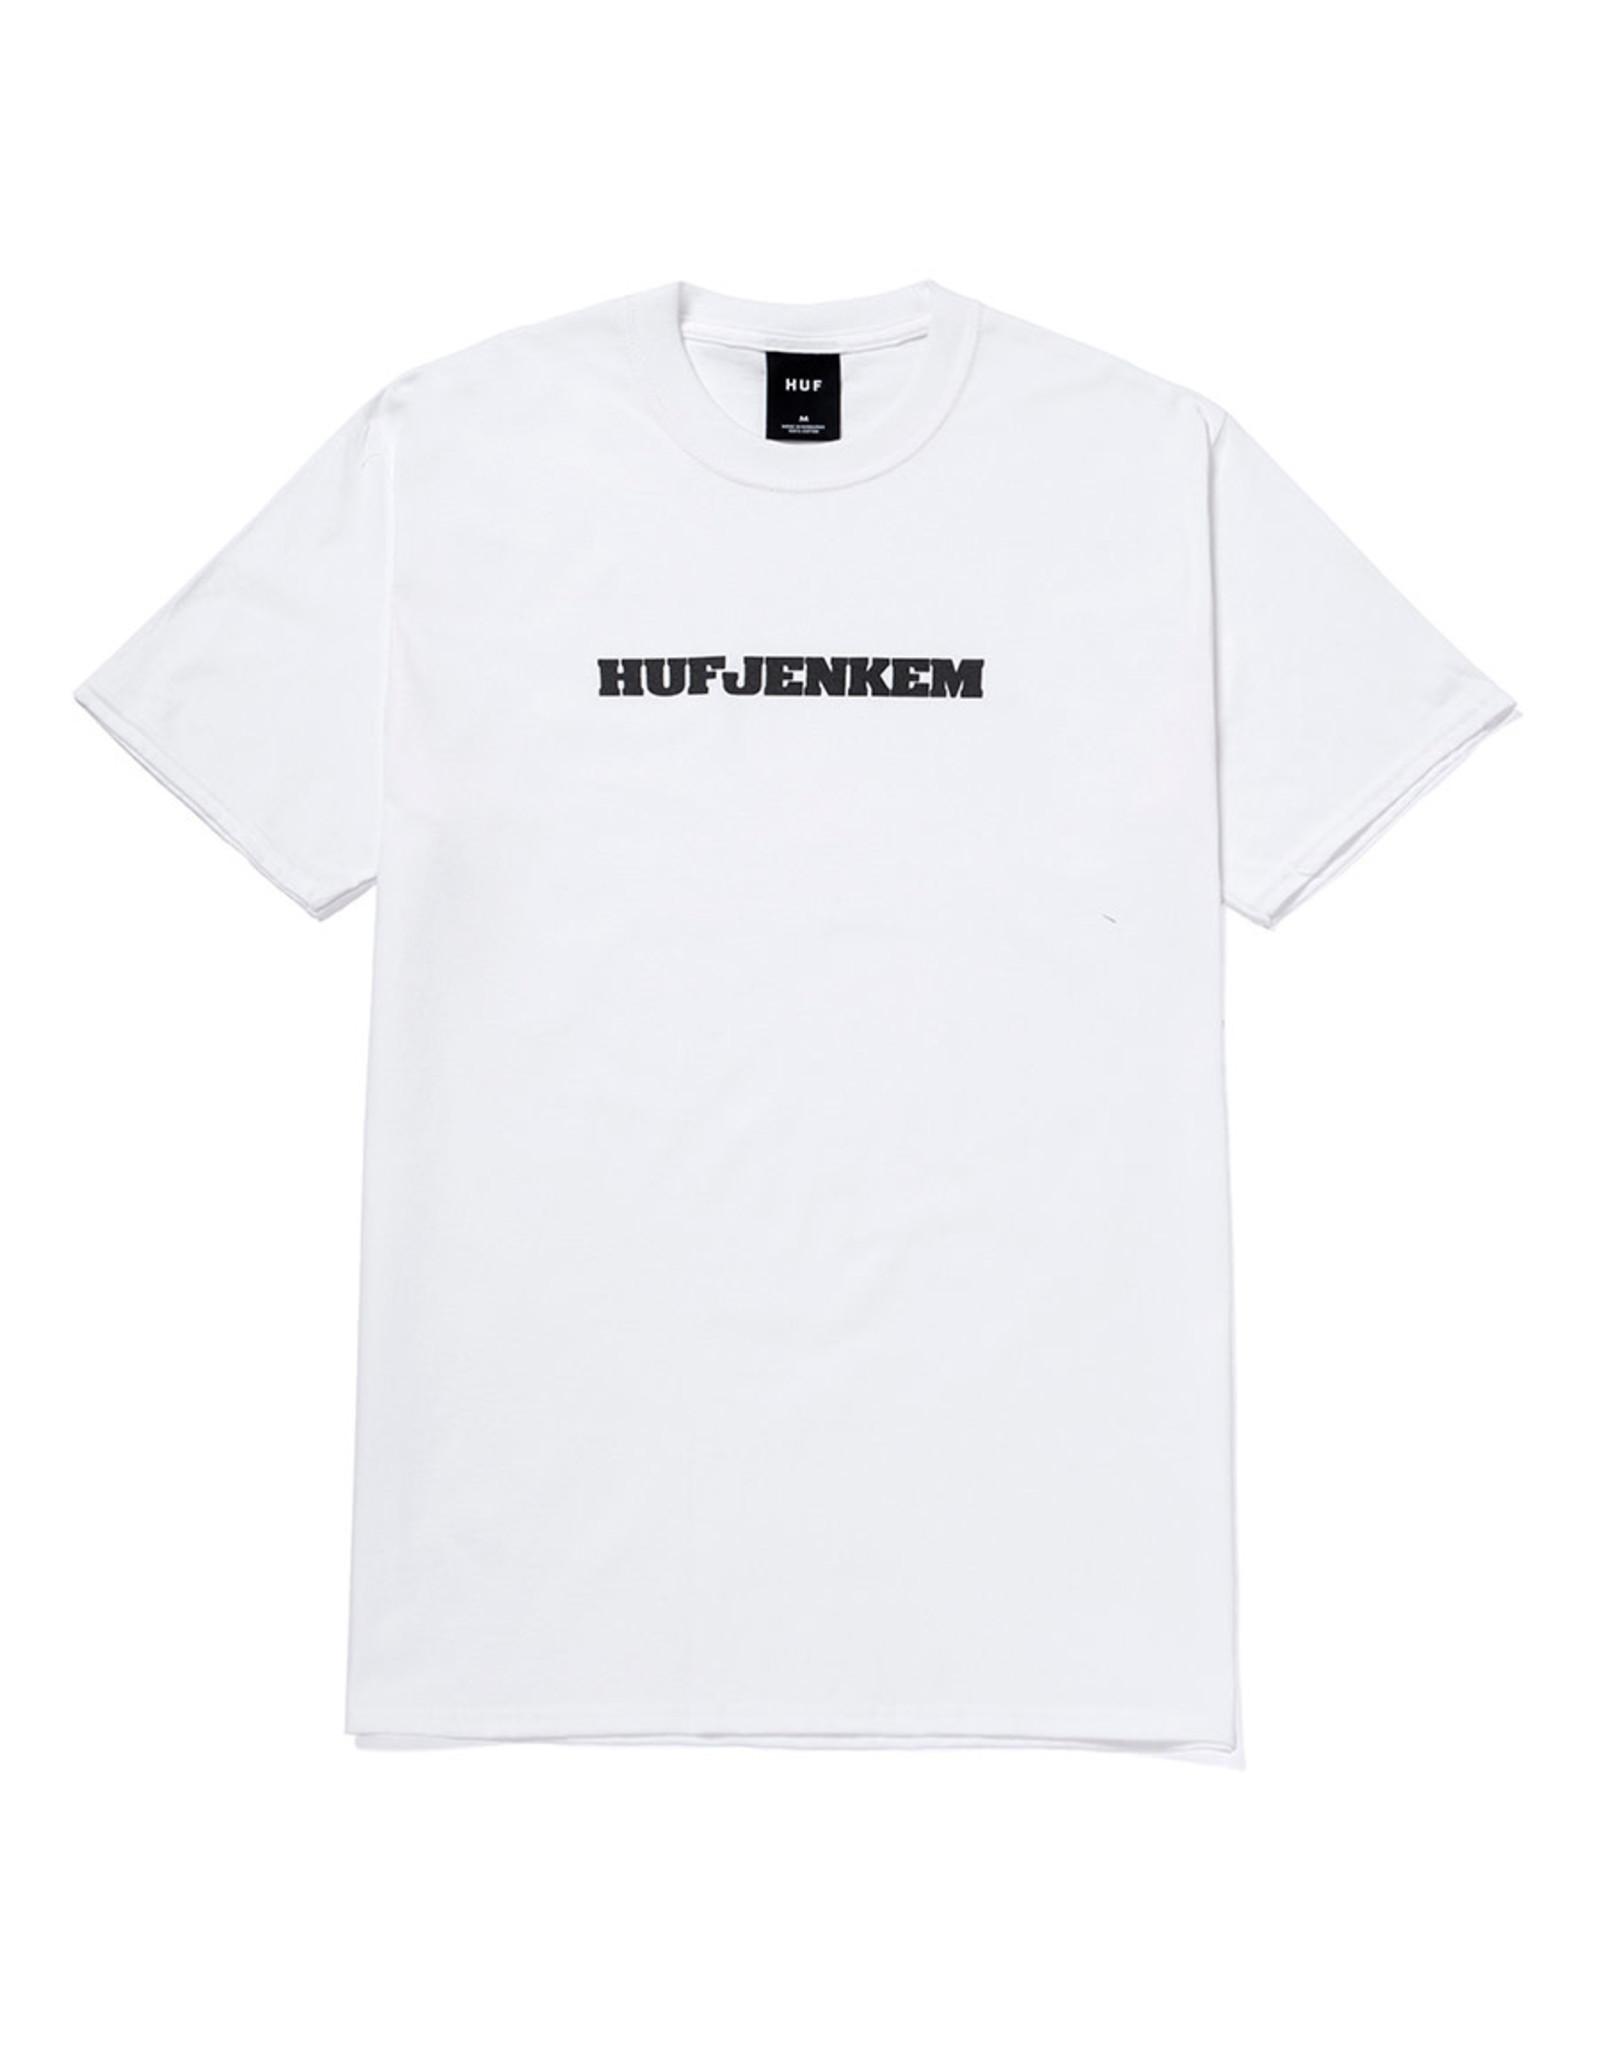 Huf Huf Tee X Jenkem Classic S/S (White)